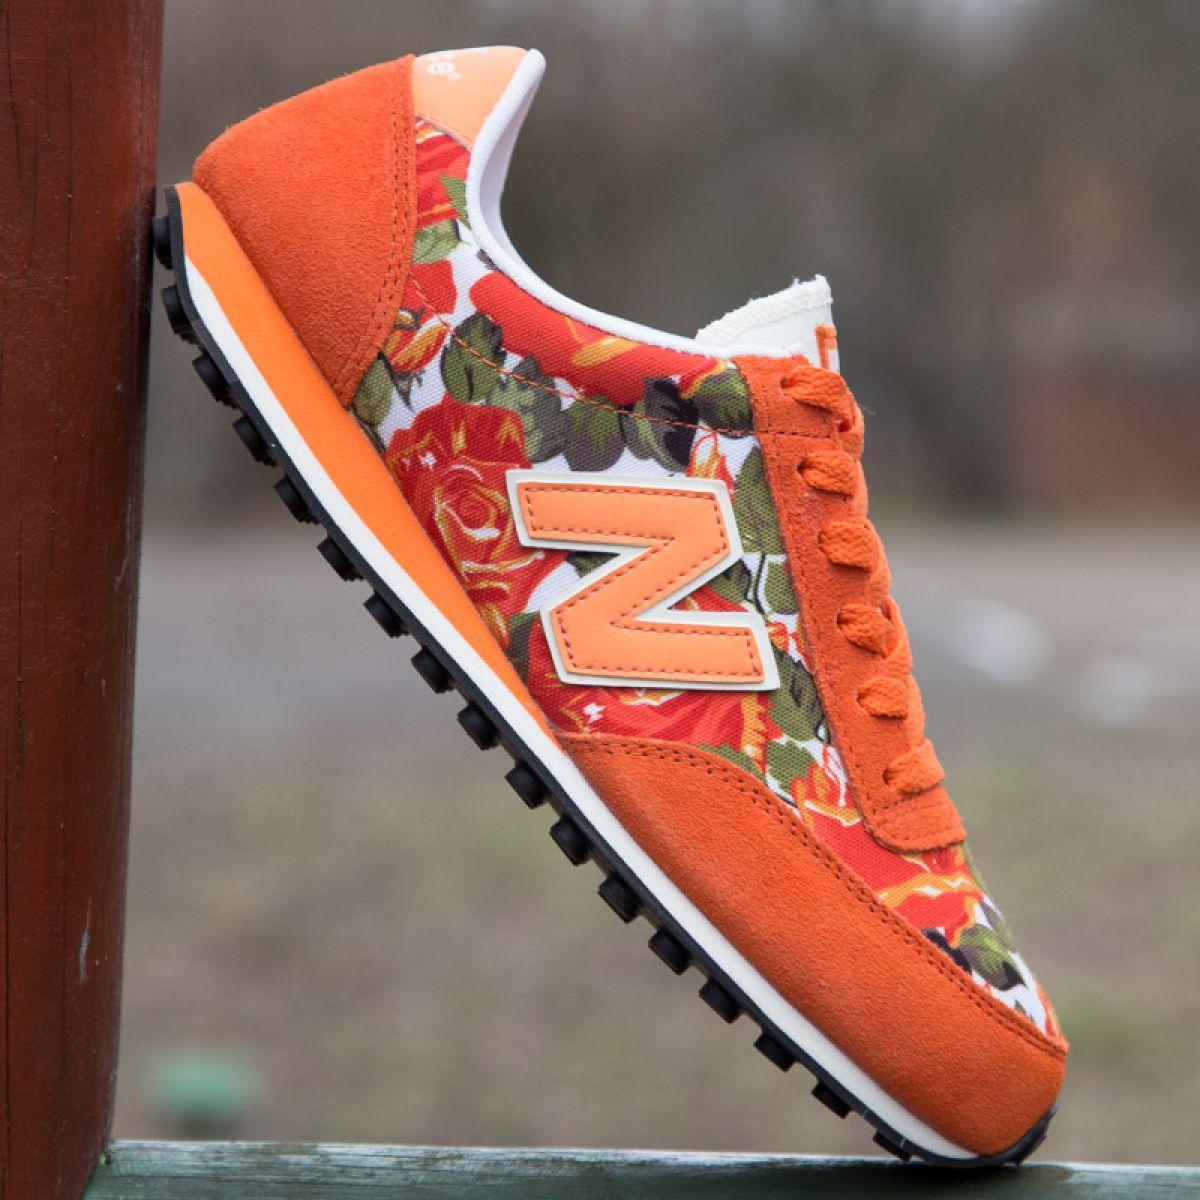 -50% NEW BALANCE UL410TSG i inne buty w RunColors z rabatami od 10 do 50%